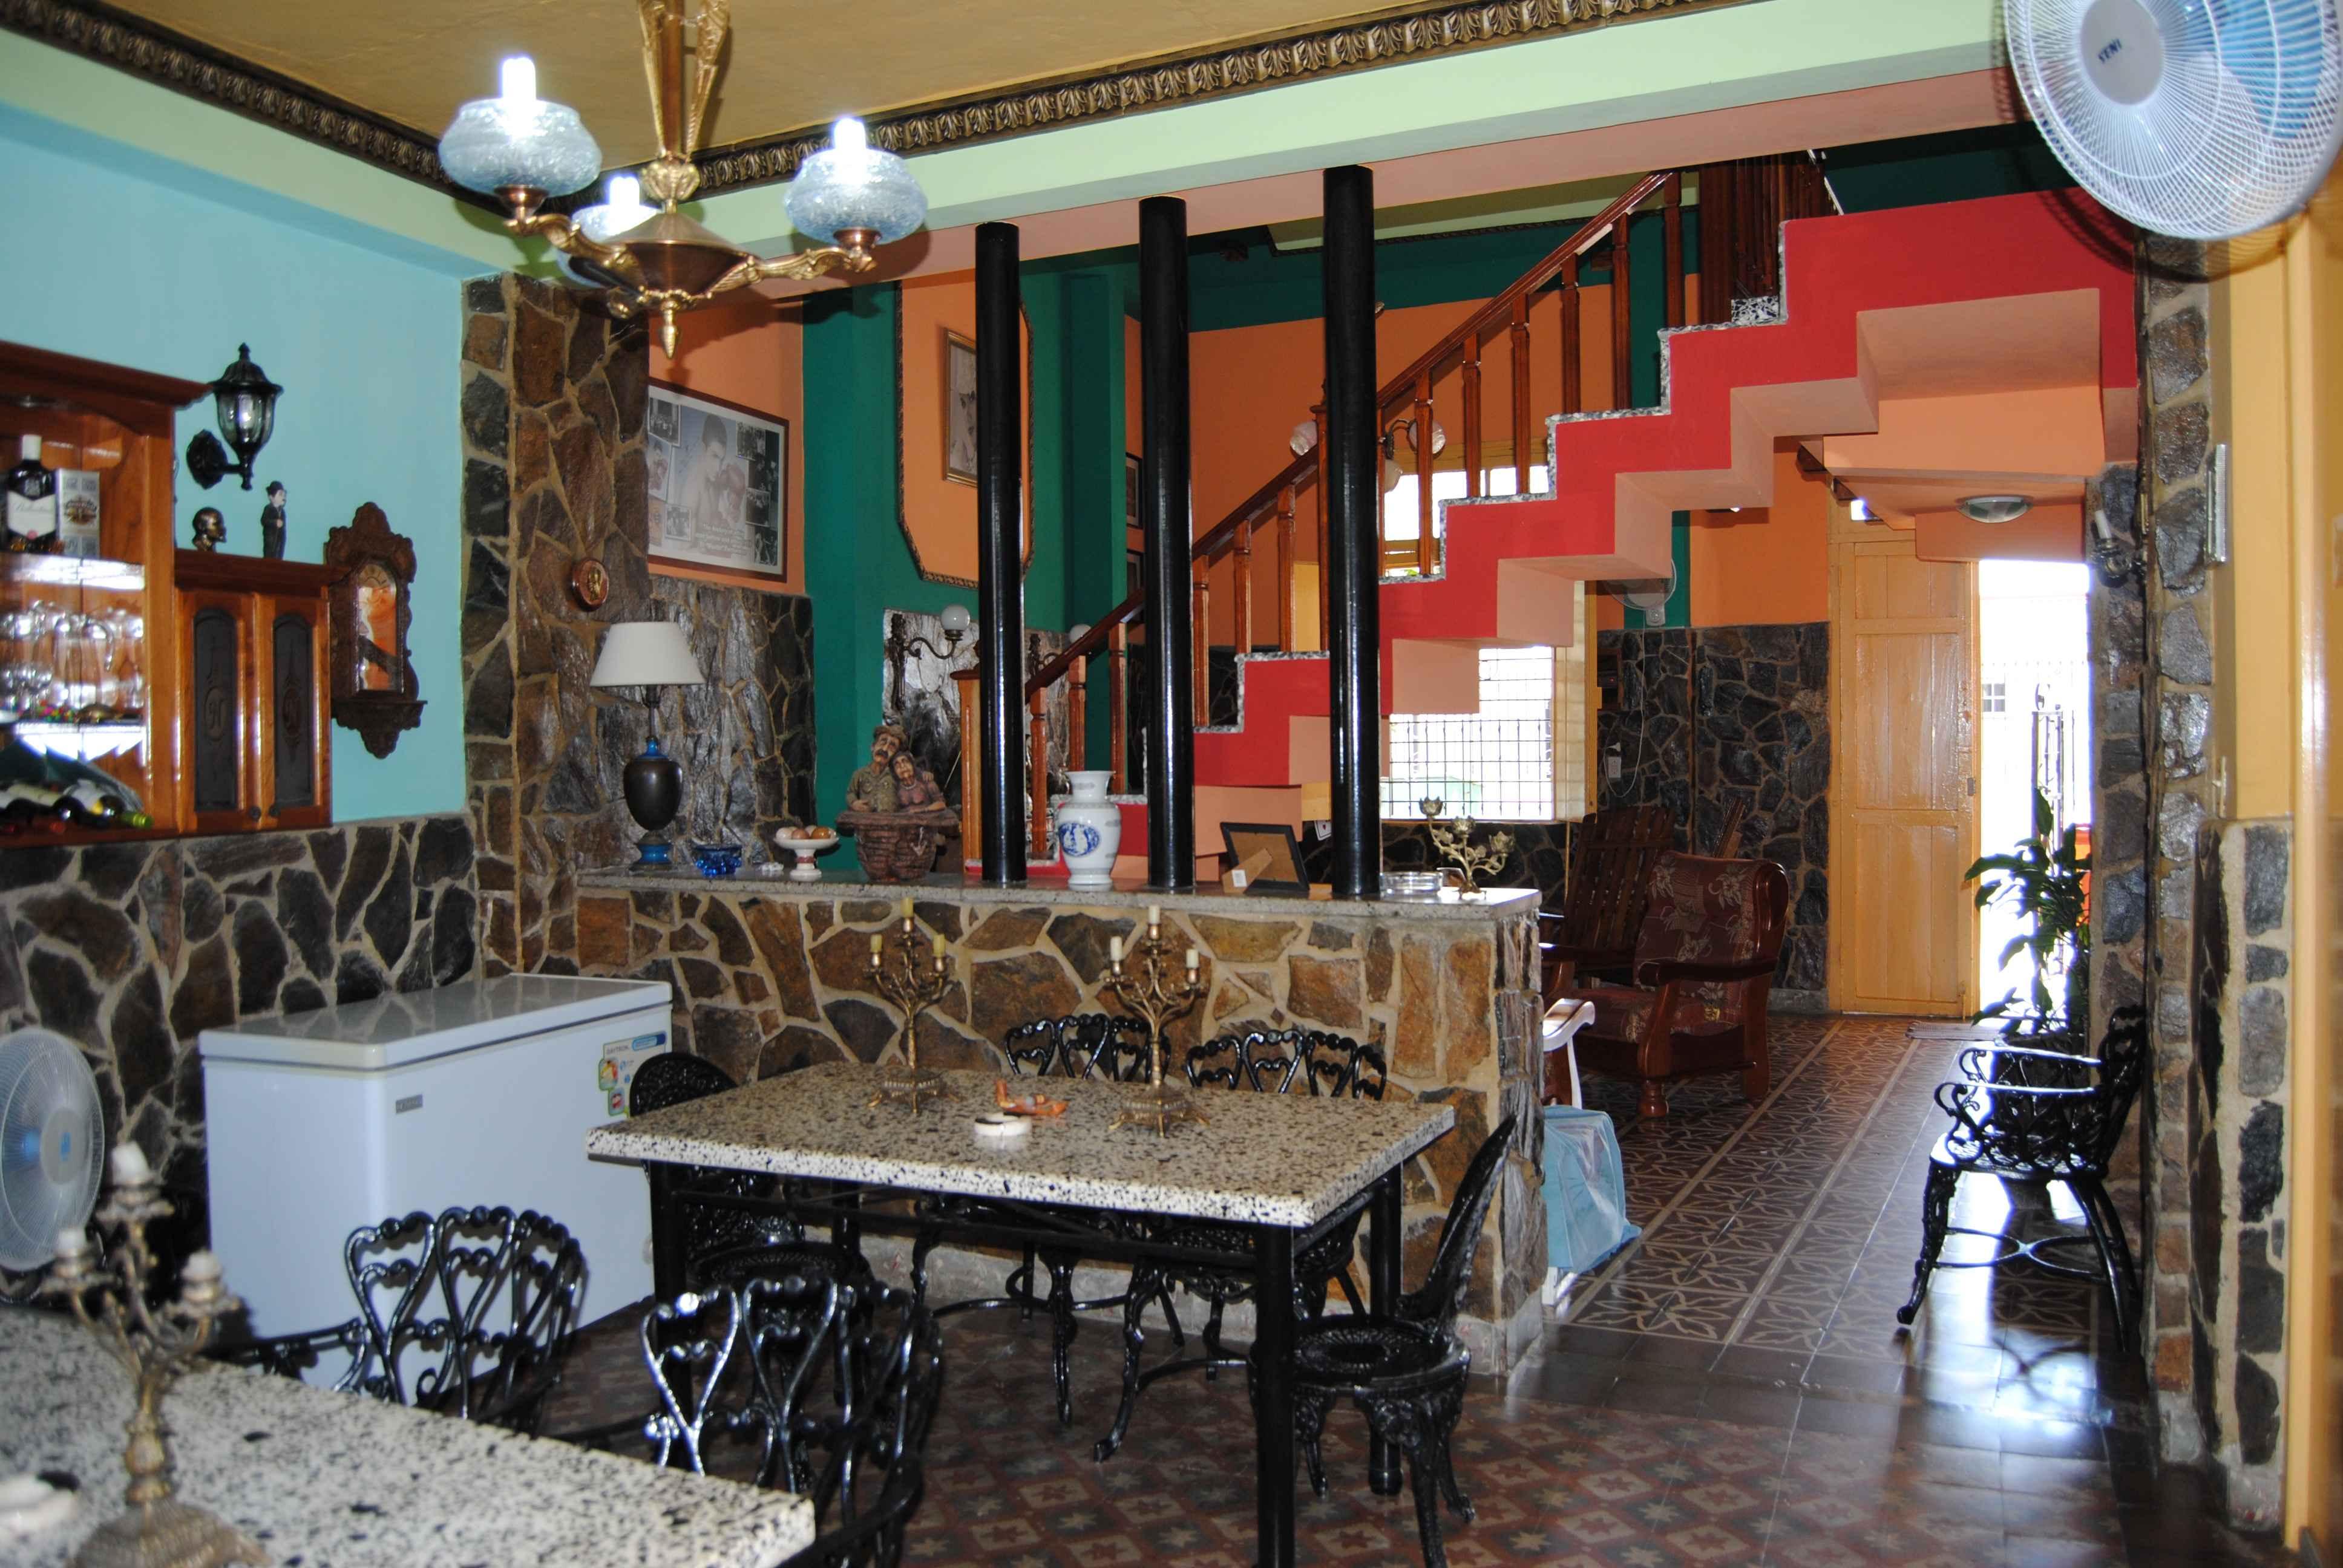 PNR005 - Casa Colonial La Nonna